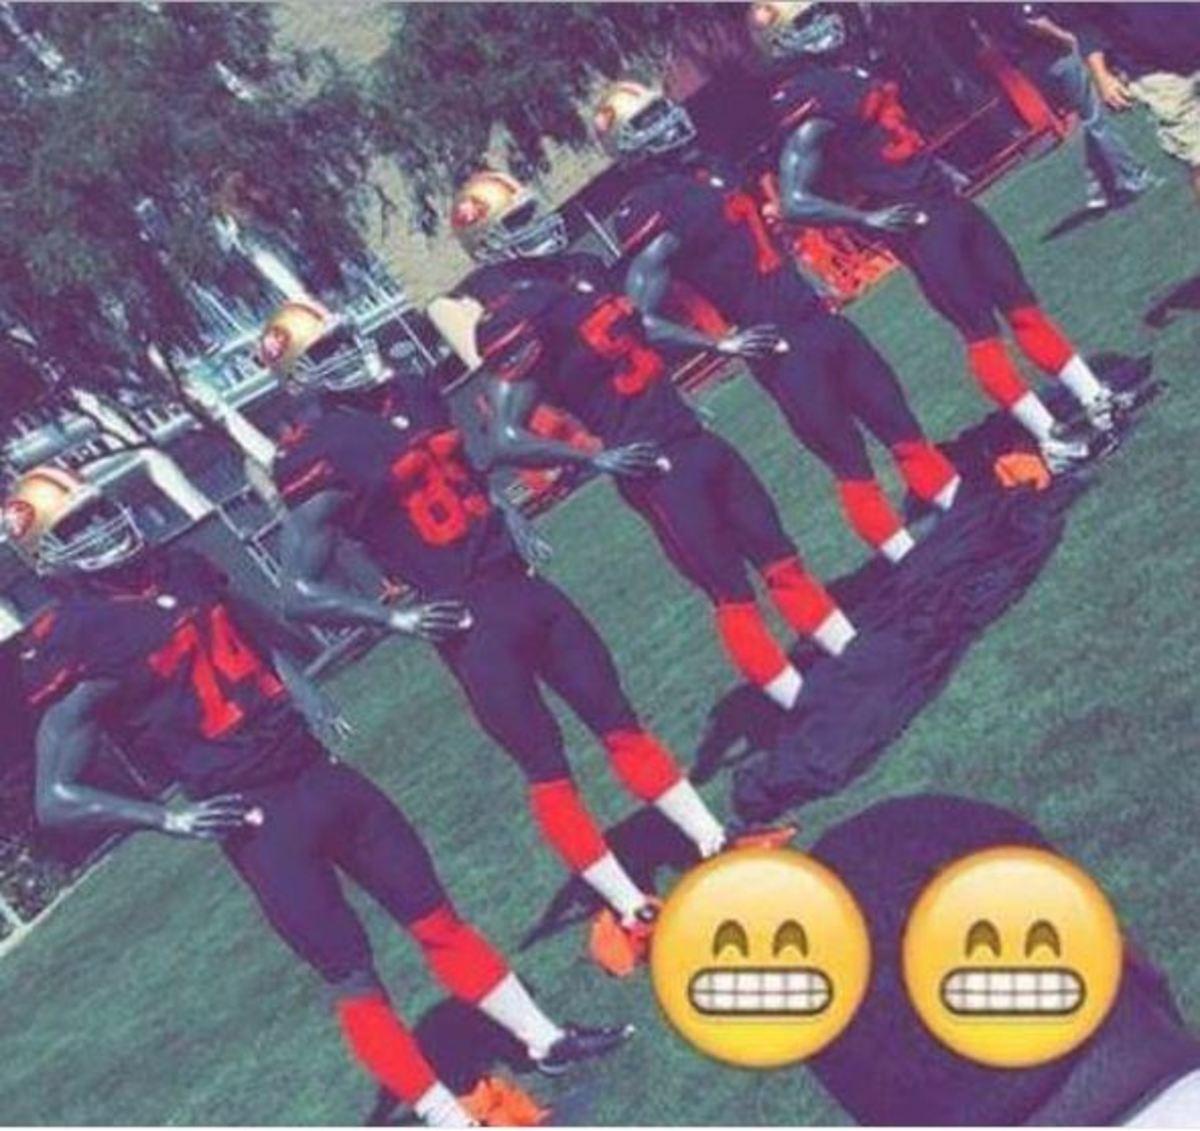 49ersblack